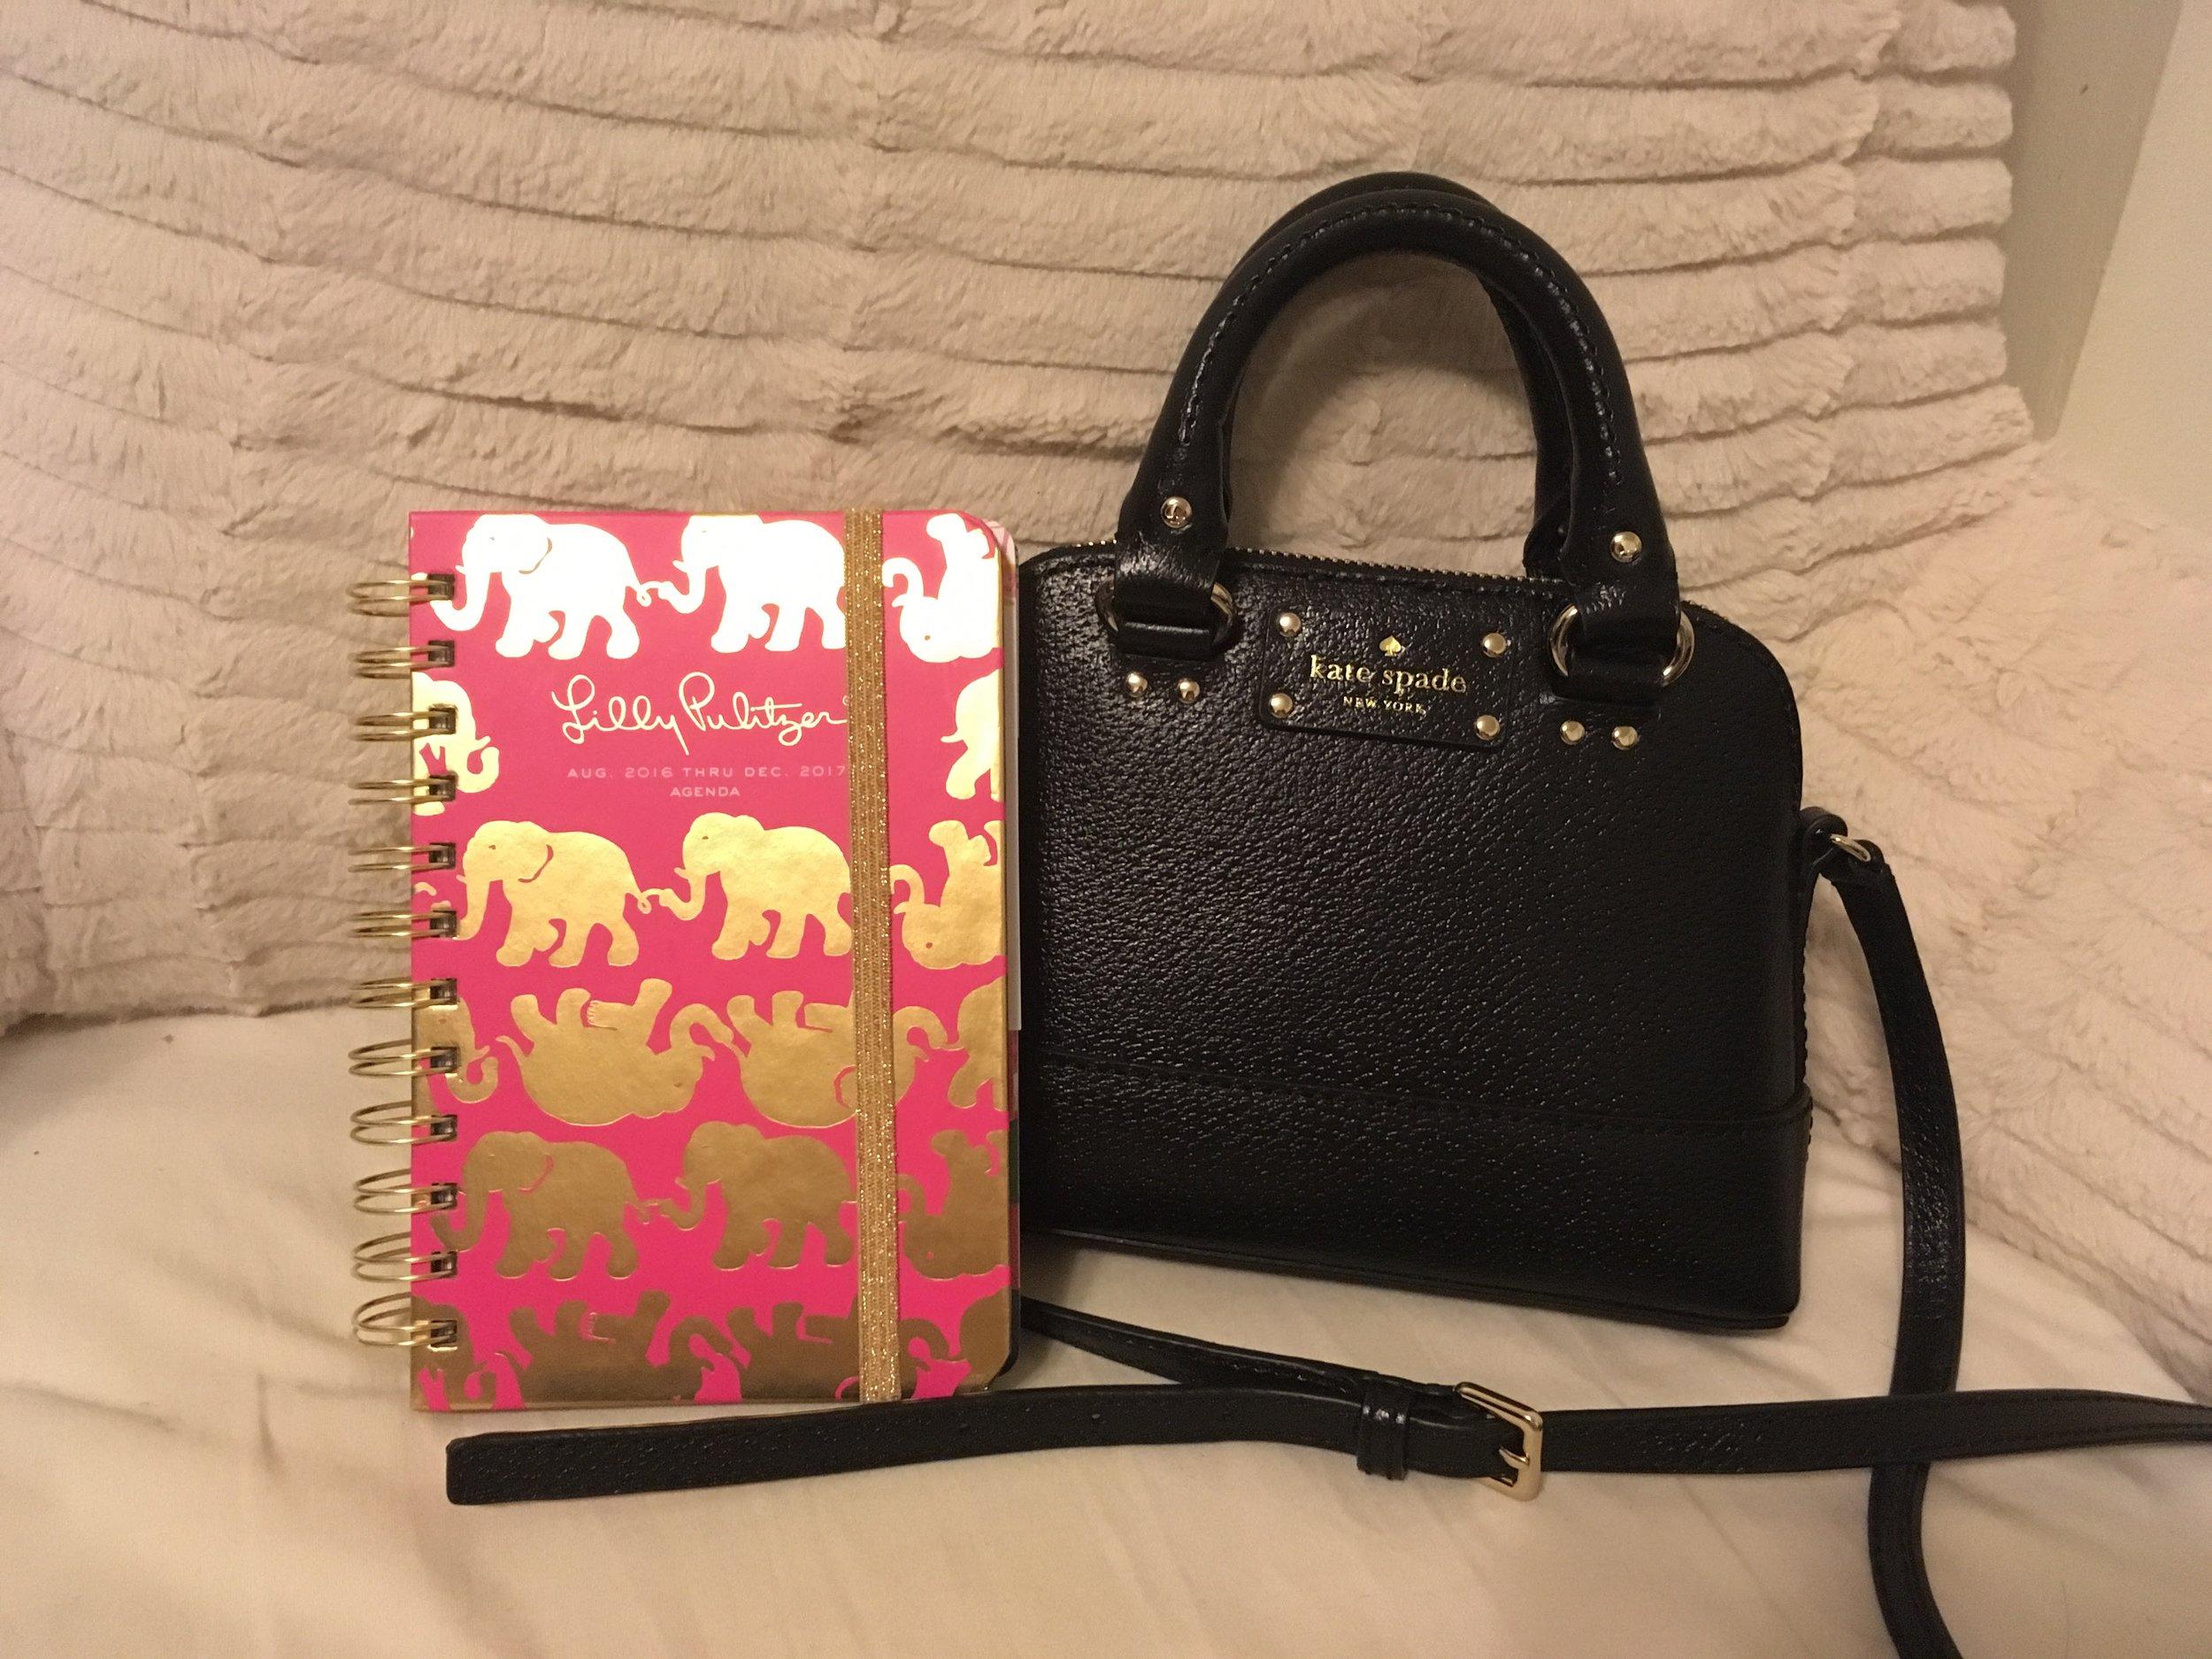 Lilly Pulitzer agenda Kate Spade bag